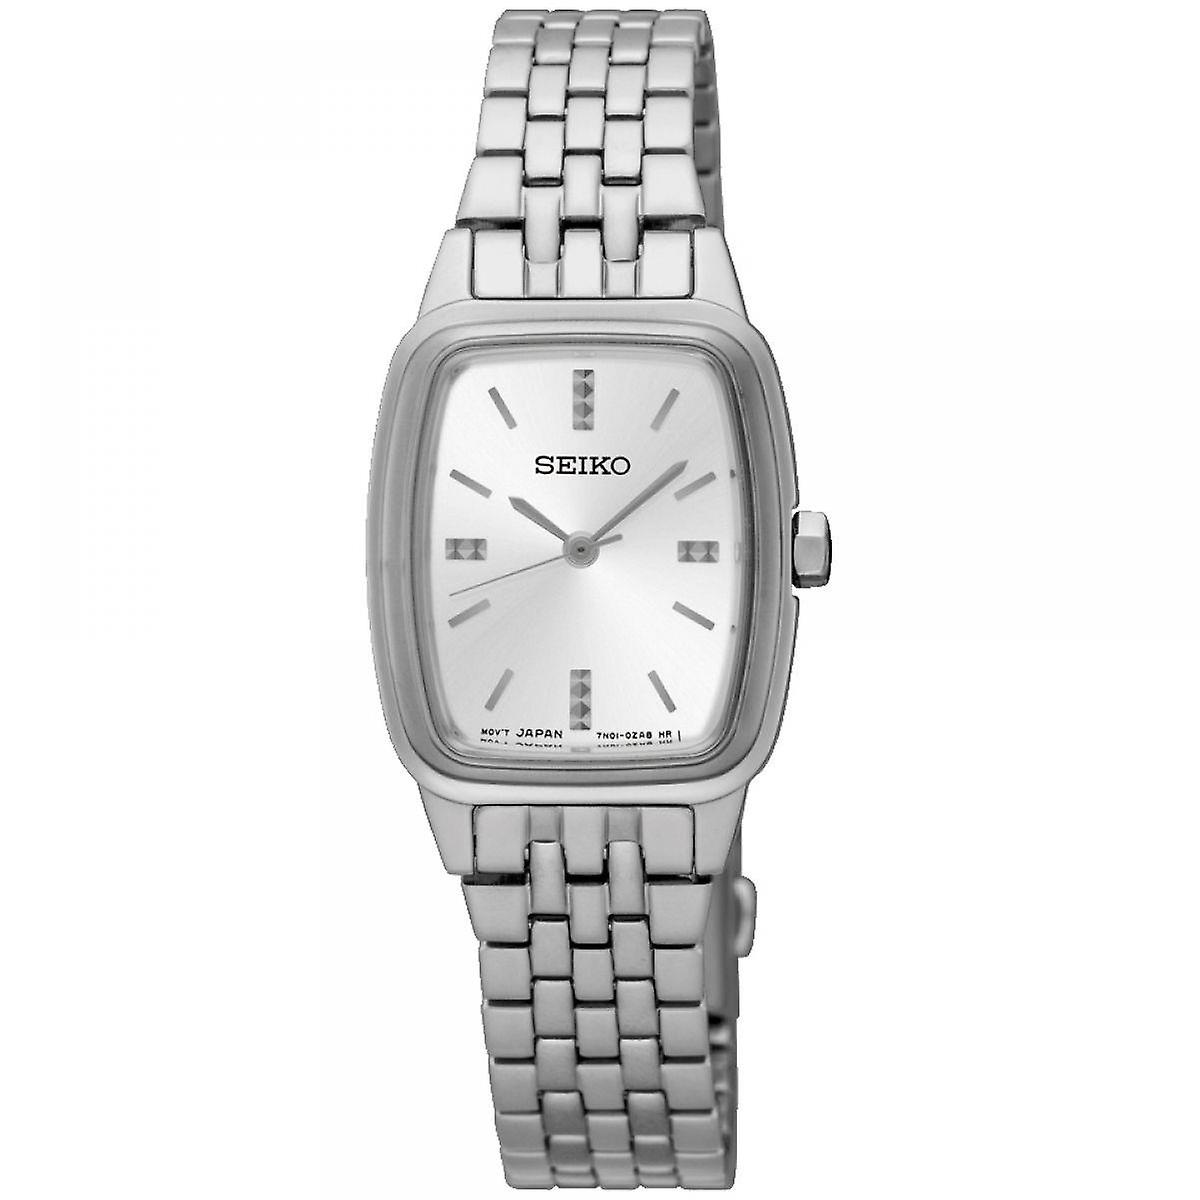 Seiko Tonneau Silver Silver Stainless Steel Strap Ladies Watch SRZ469P1 22mm